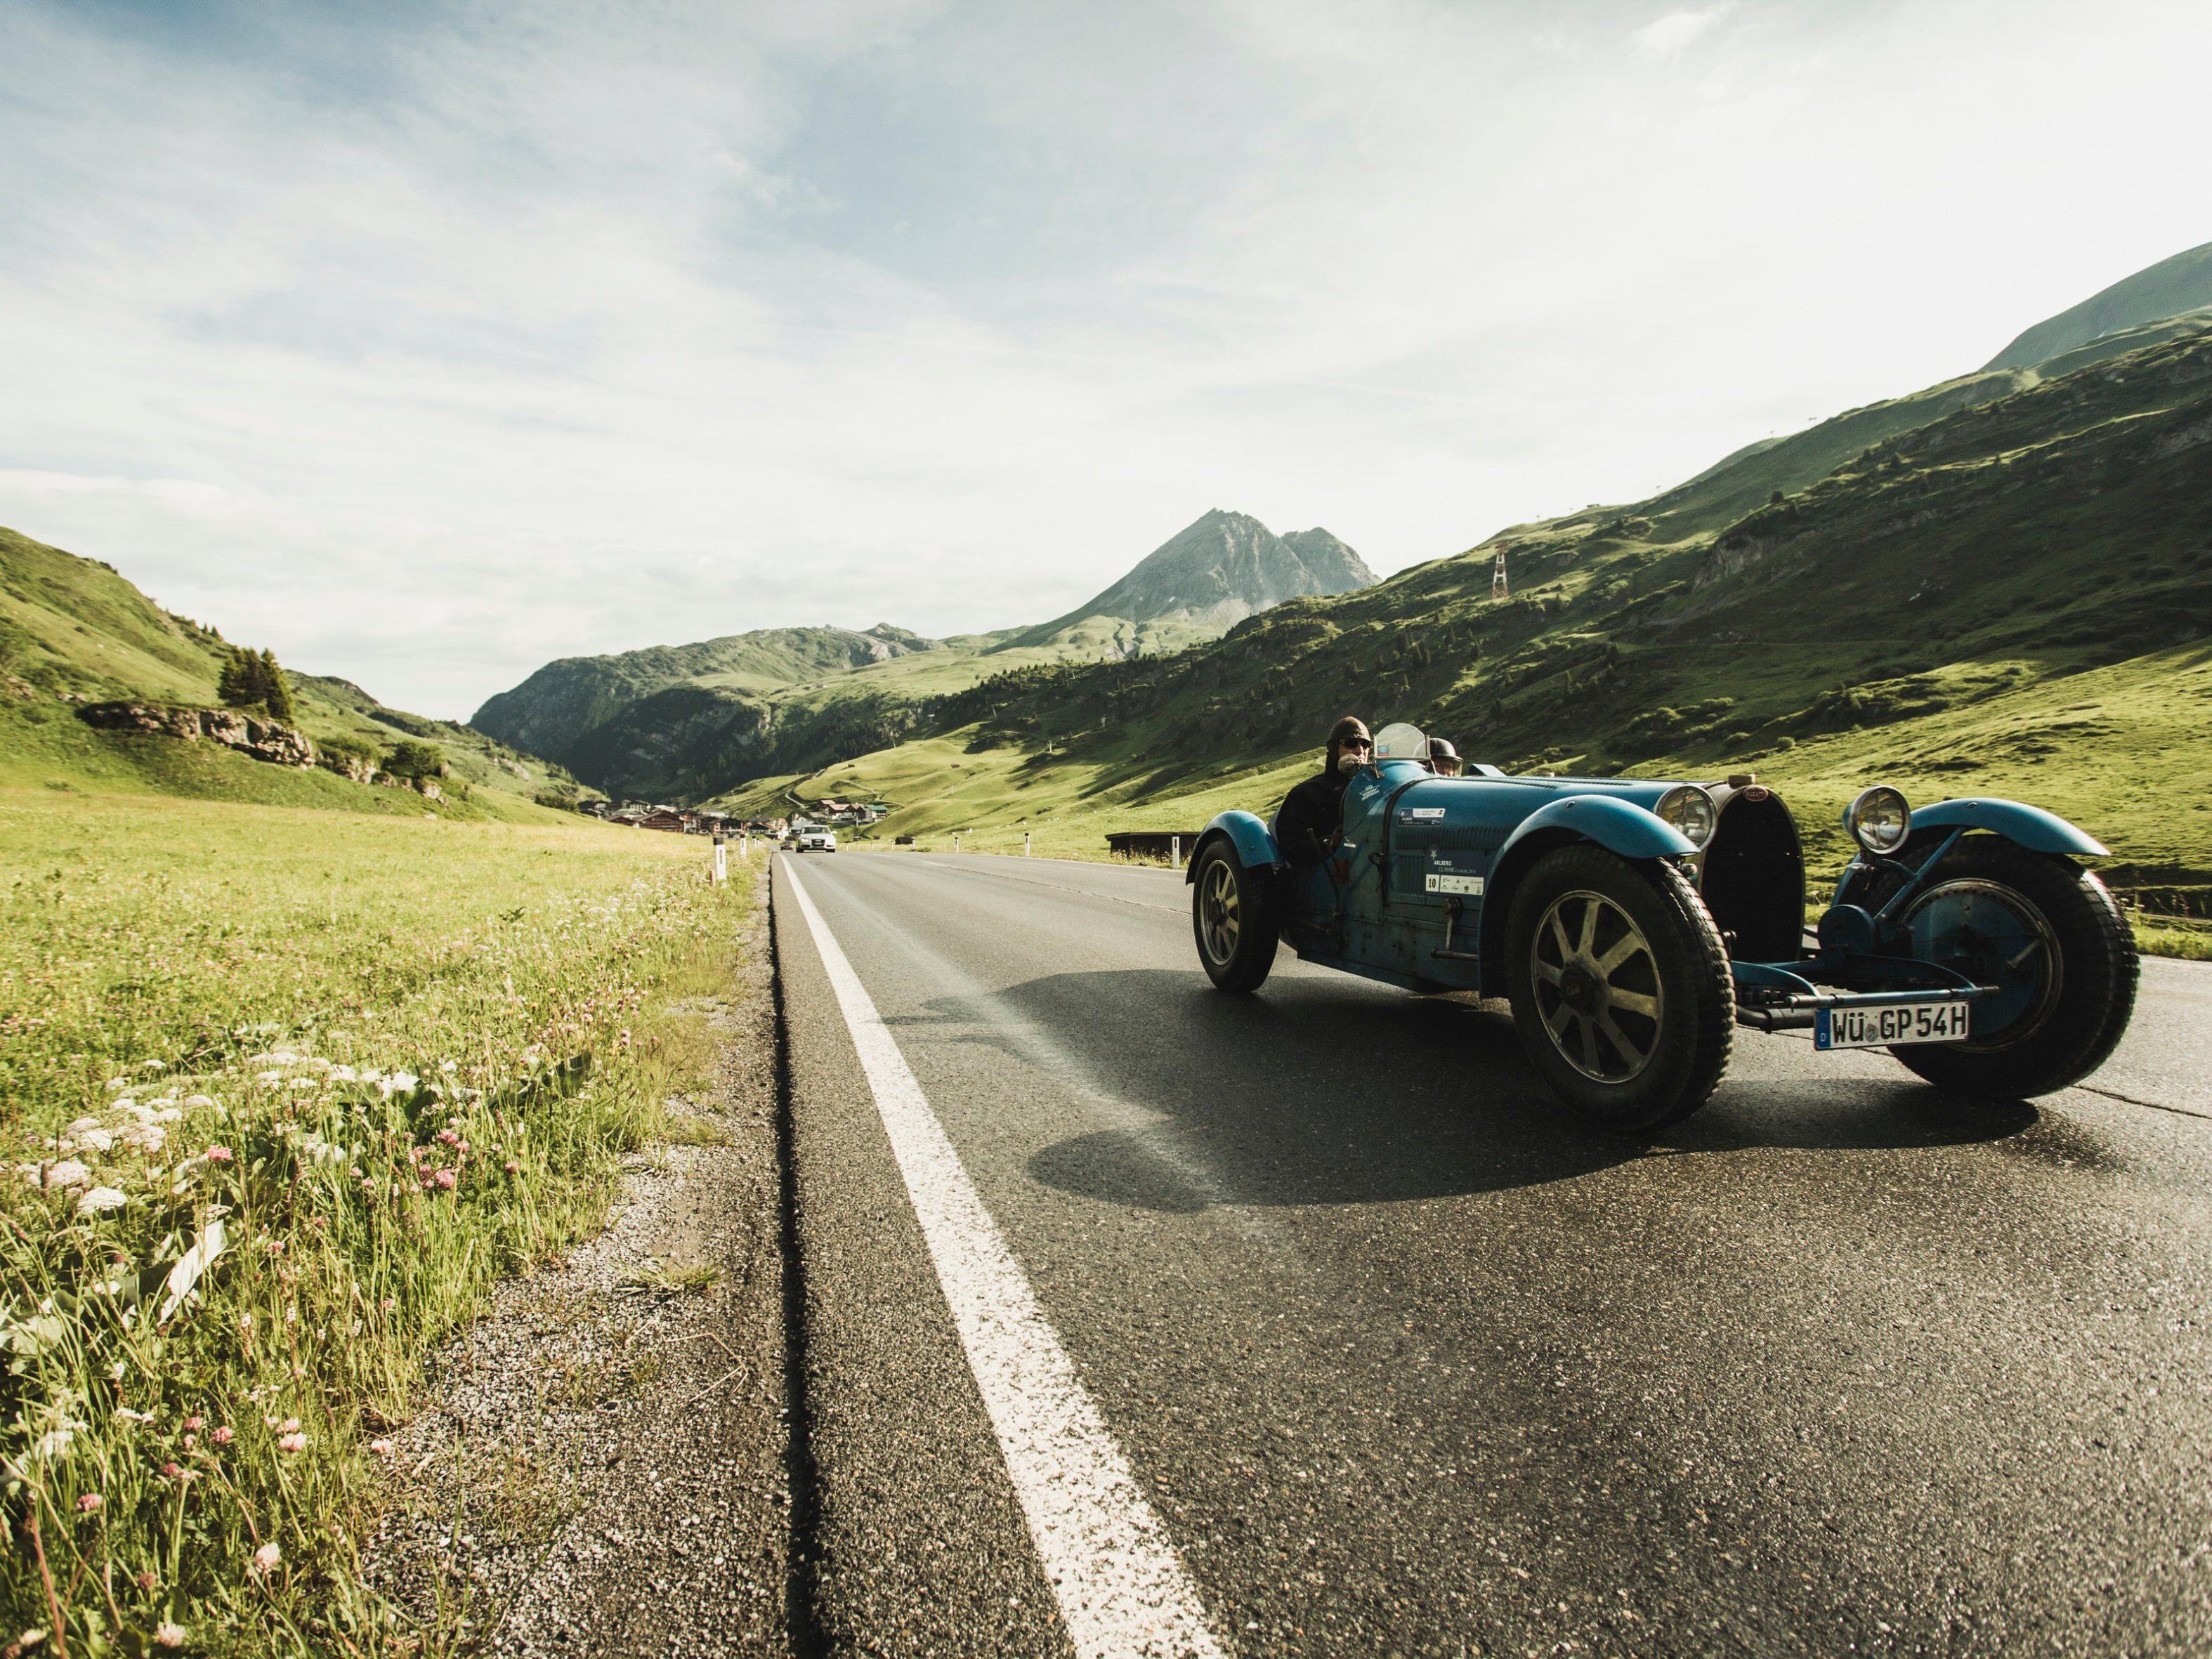 Traumautos, Traumkulissen: Arlberg Classic Car Rally 2015.